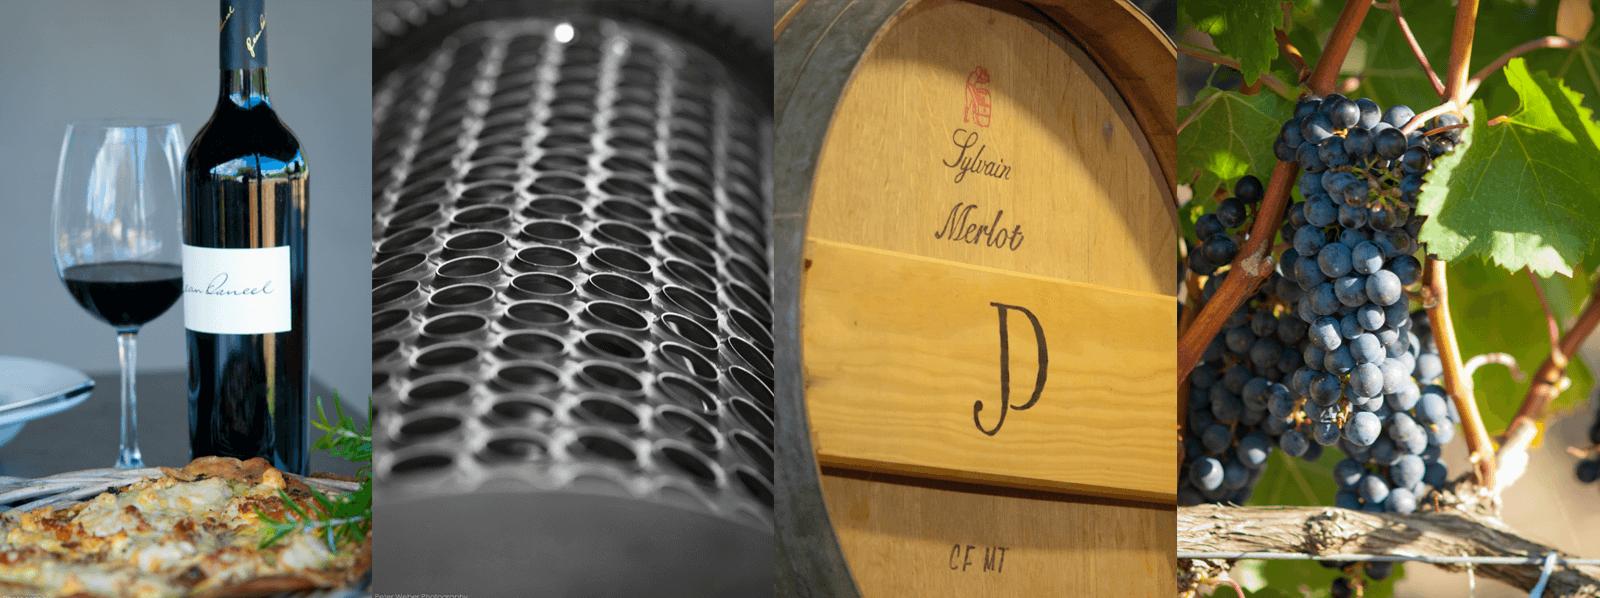 JD Wines